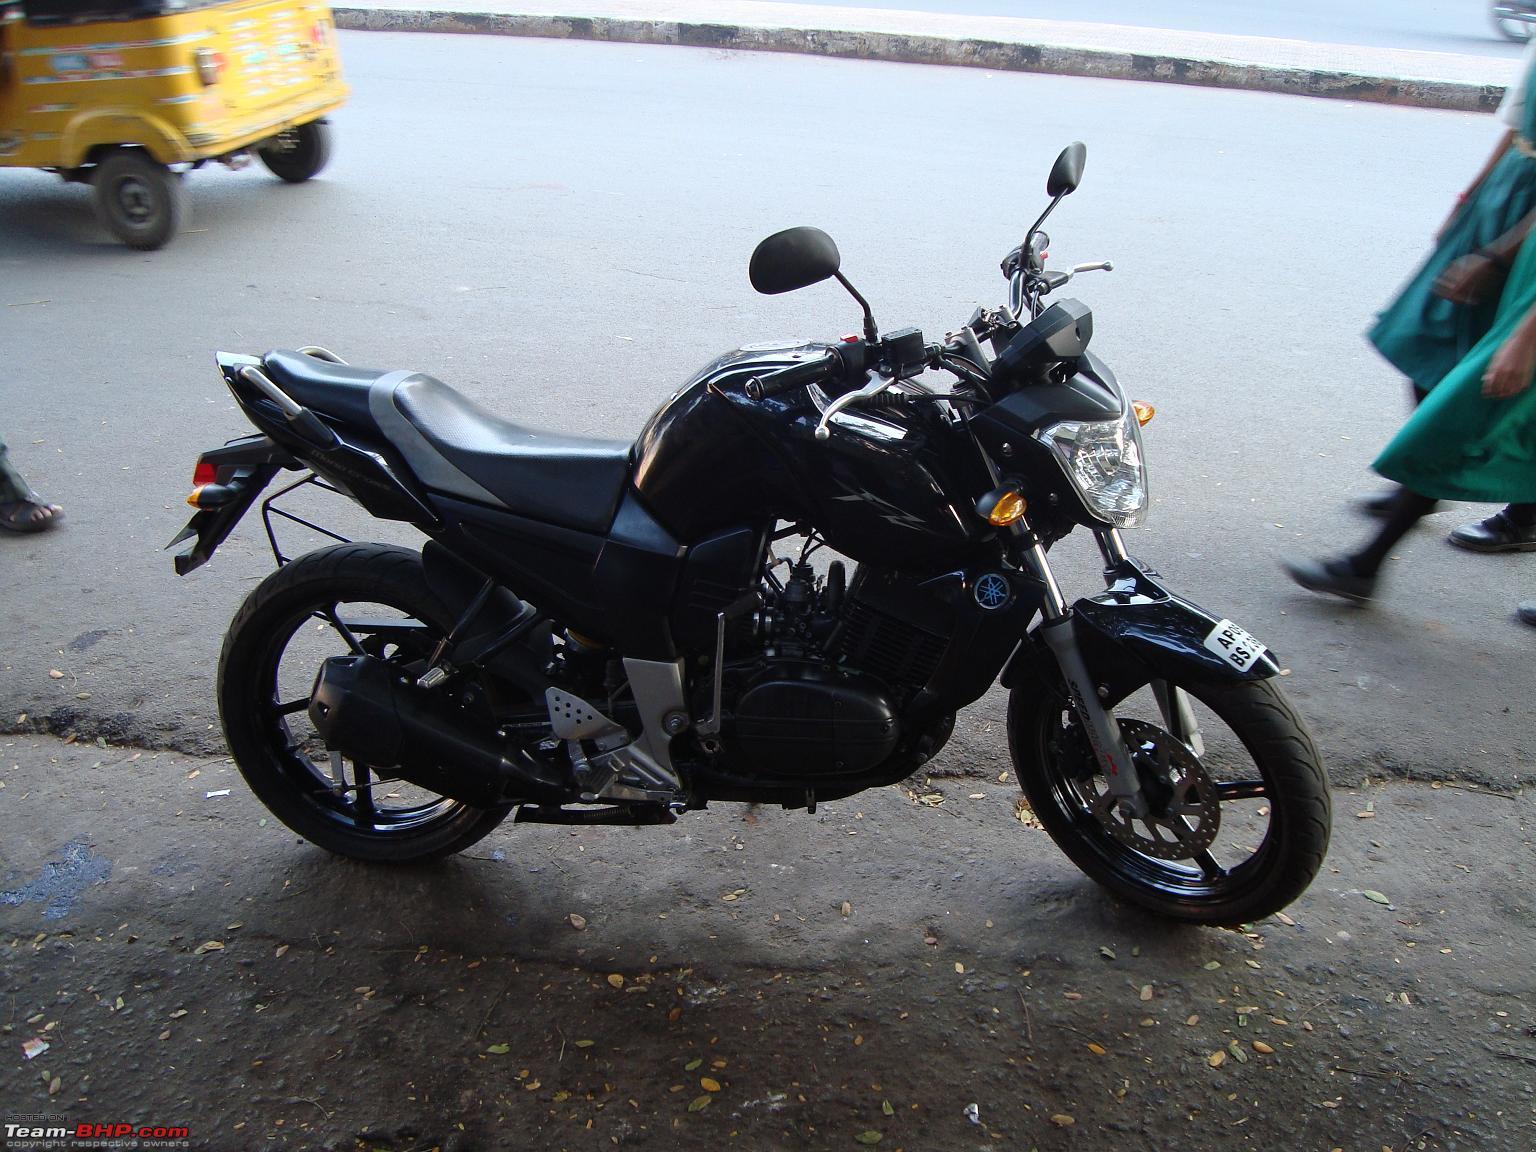 Yamaha fz350 team bhp for Yamaha 350cc motorcycles